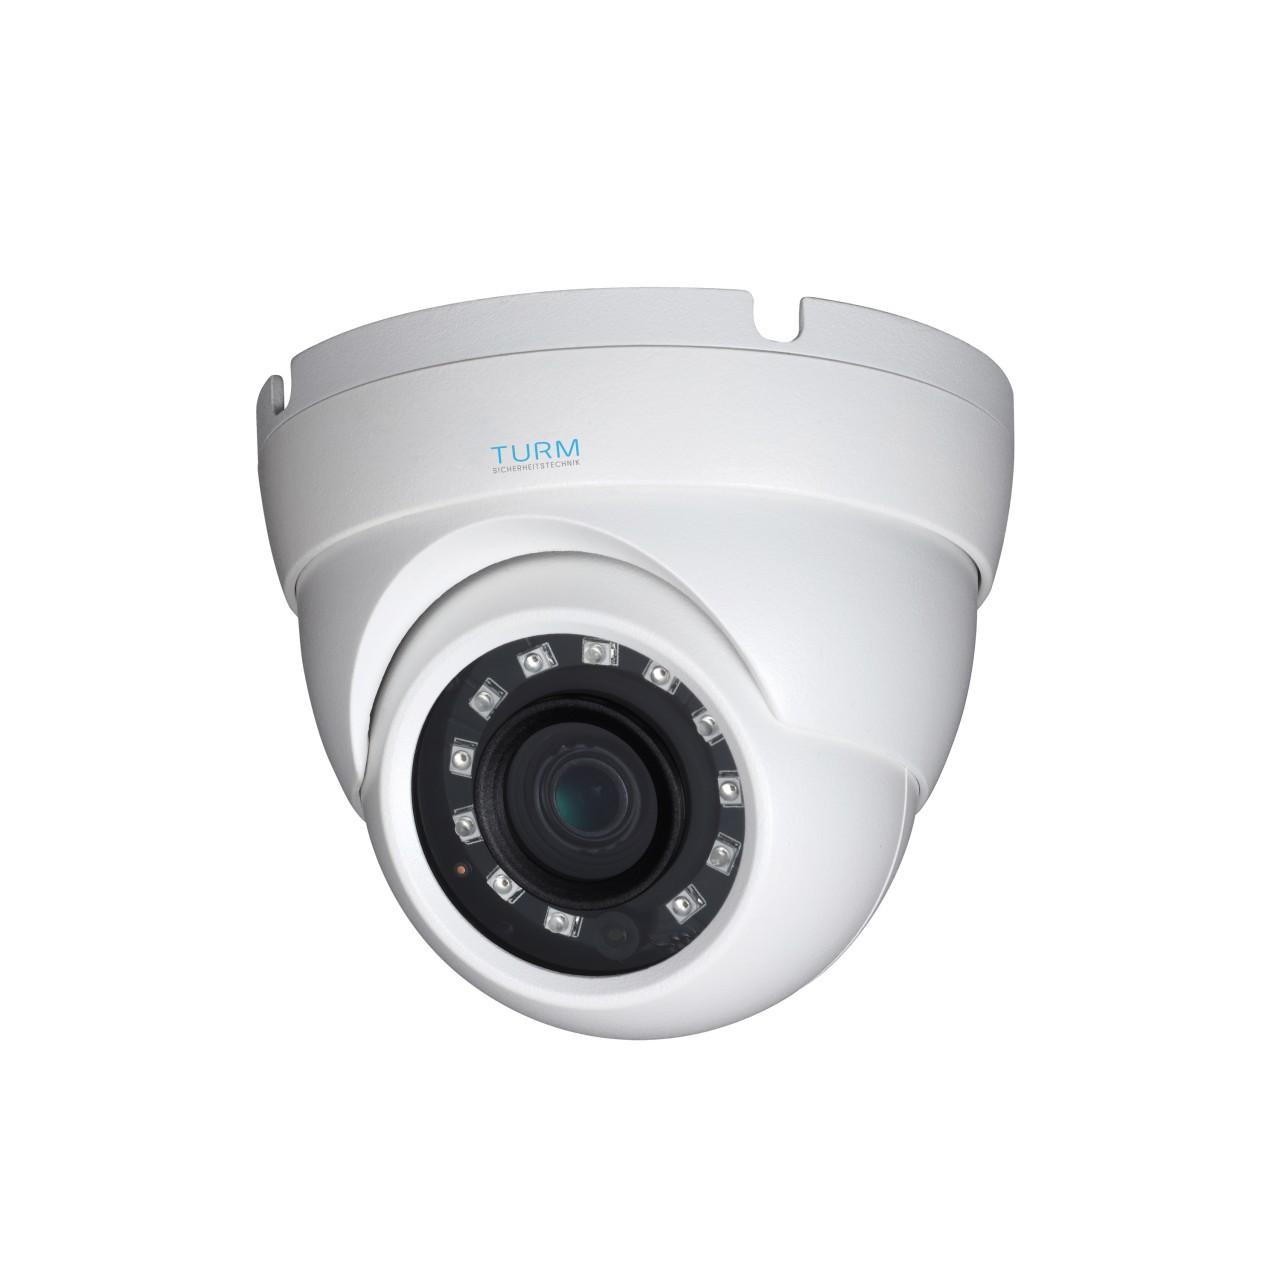 TURM HDCVI Lite 4,1 MP Dome Kamera mit 30m Nachtsicht und 2.8mm Objektiv